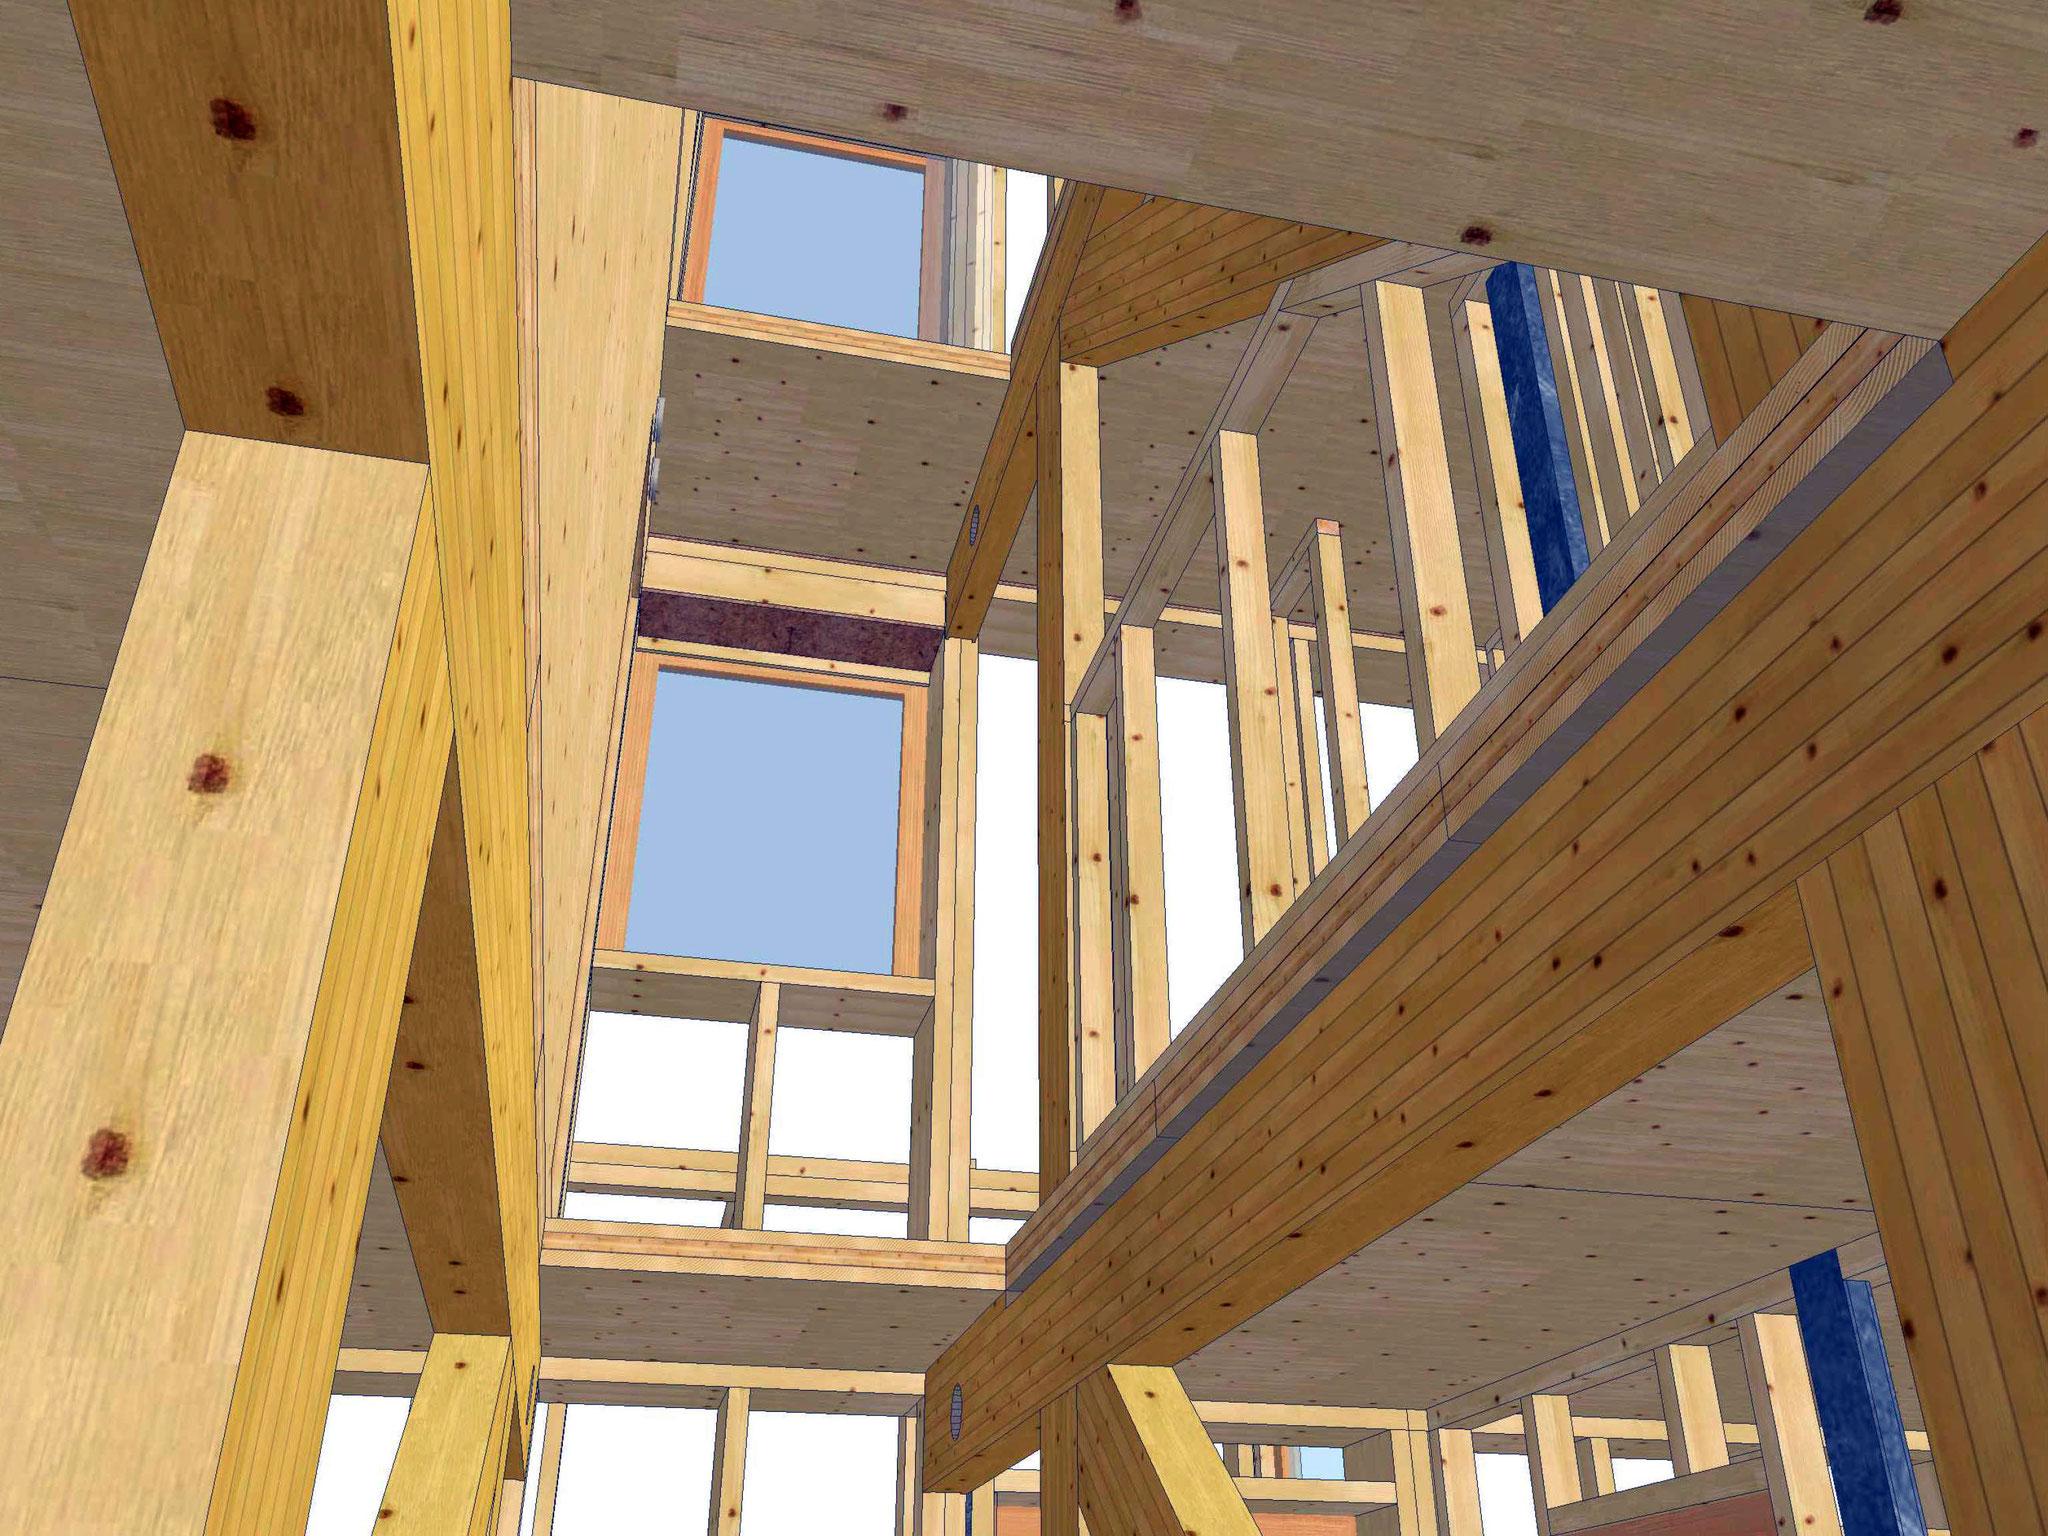 Konstruktion - Quelle: Holzbau Unfried